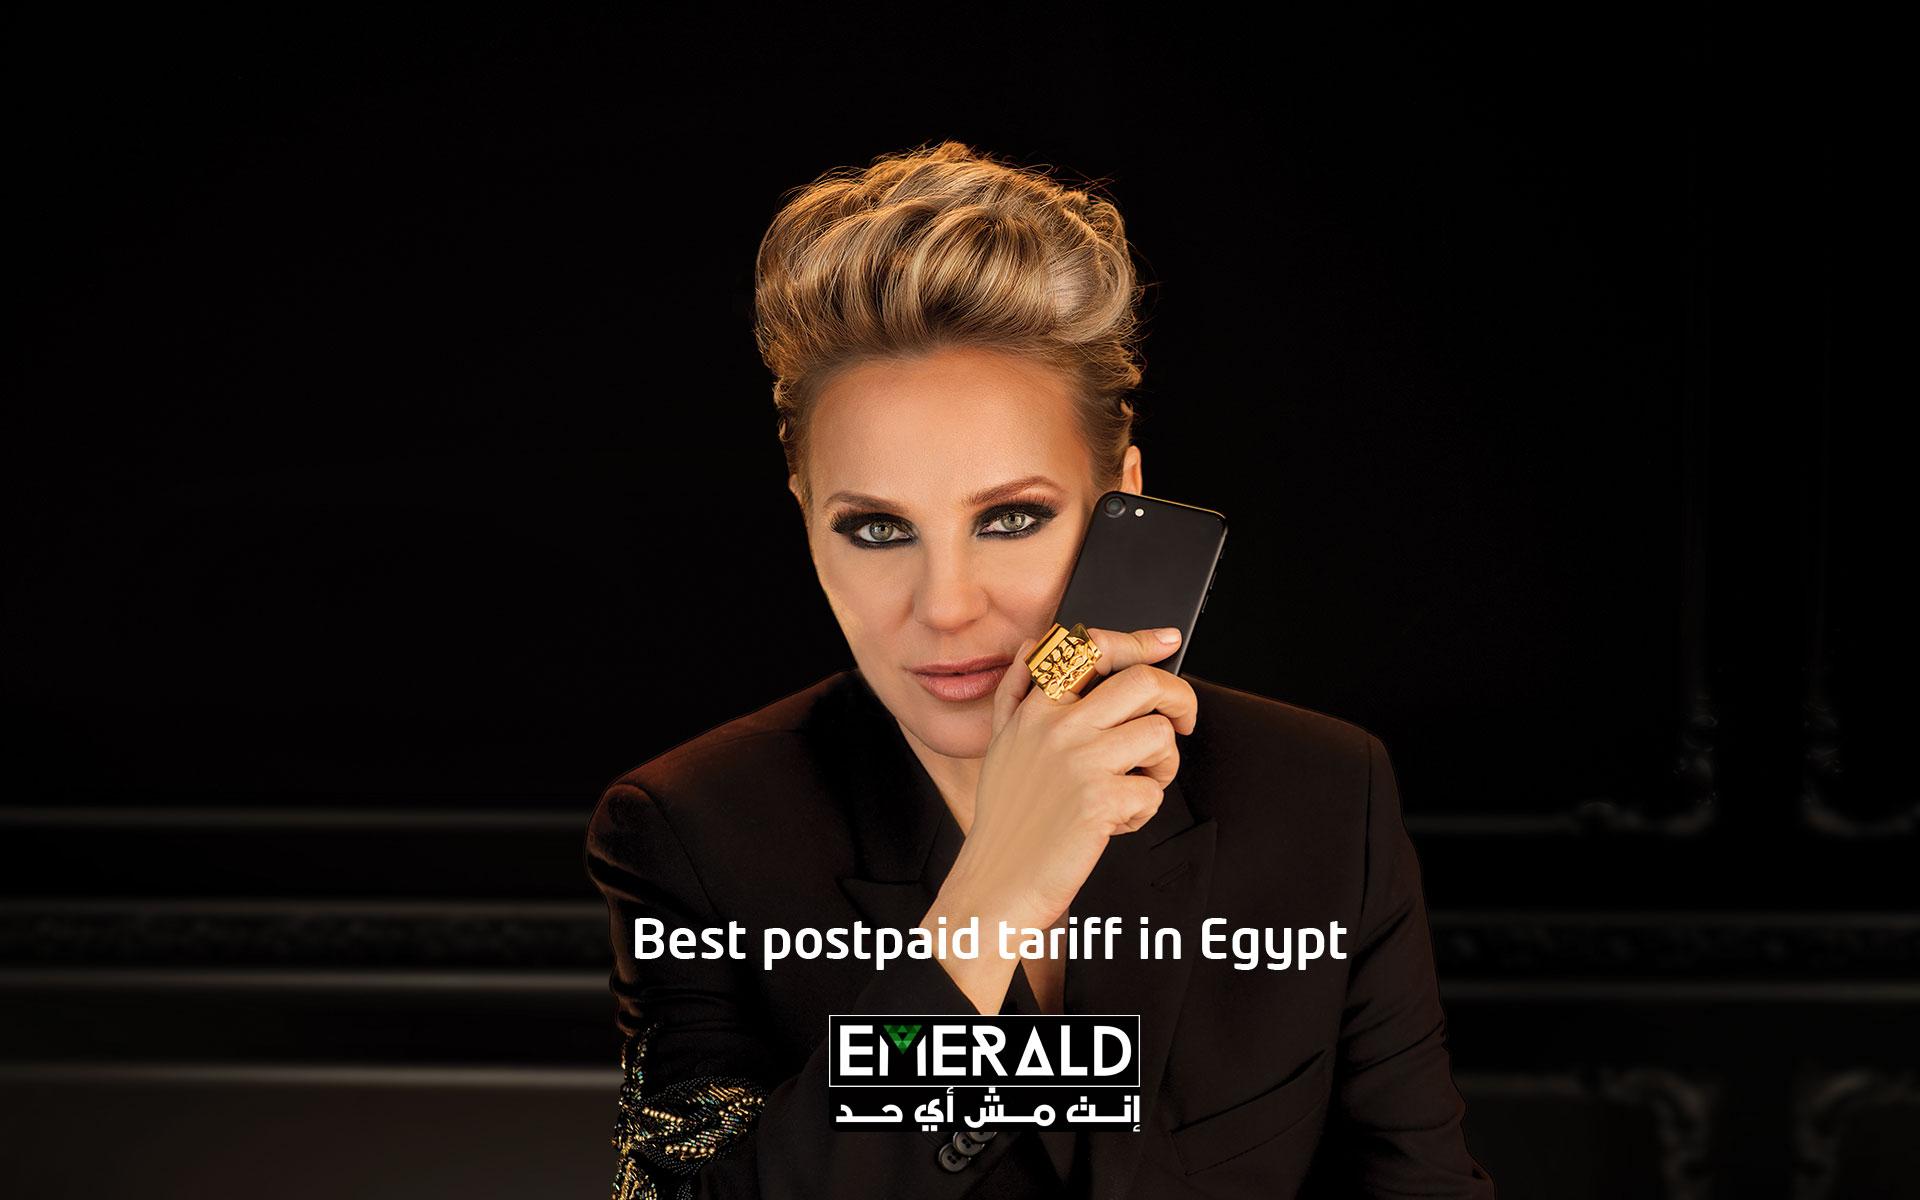 ETISALAT OF UAE